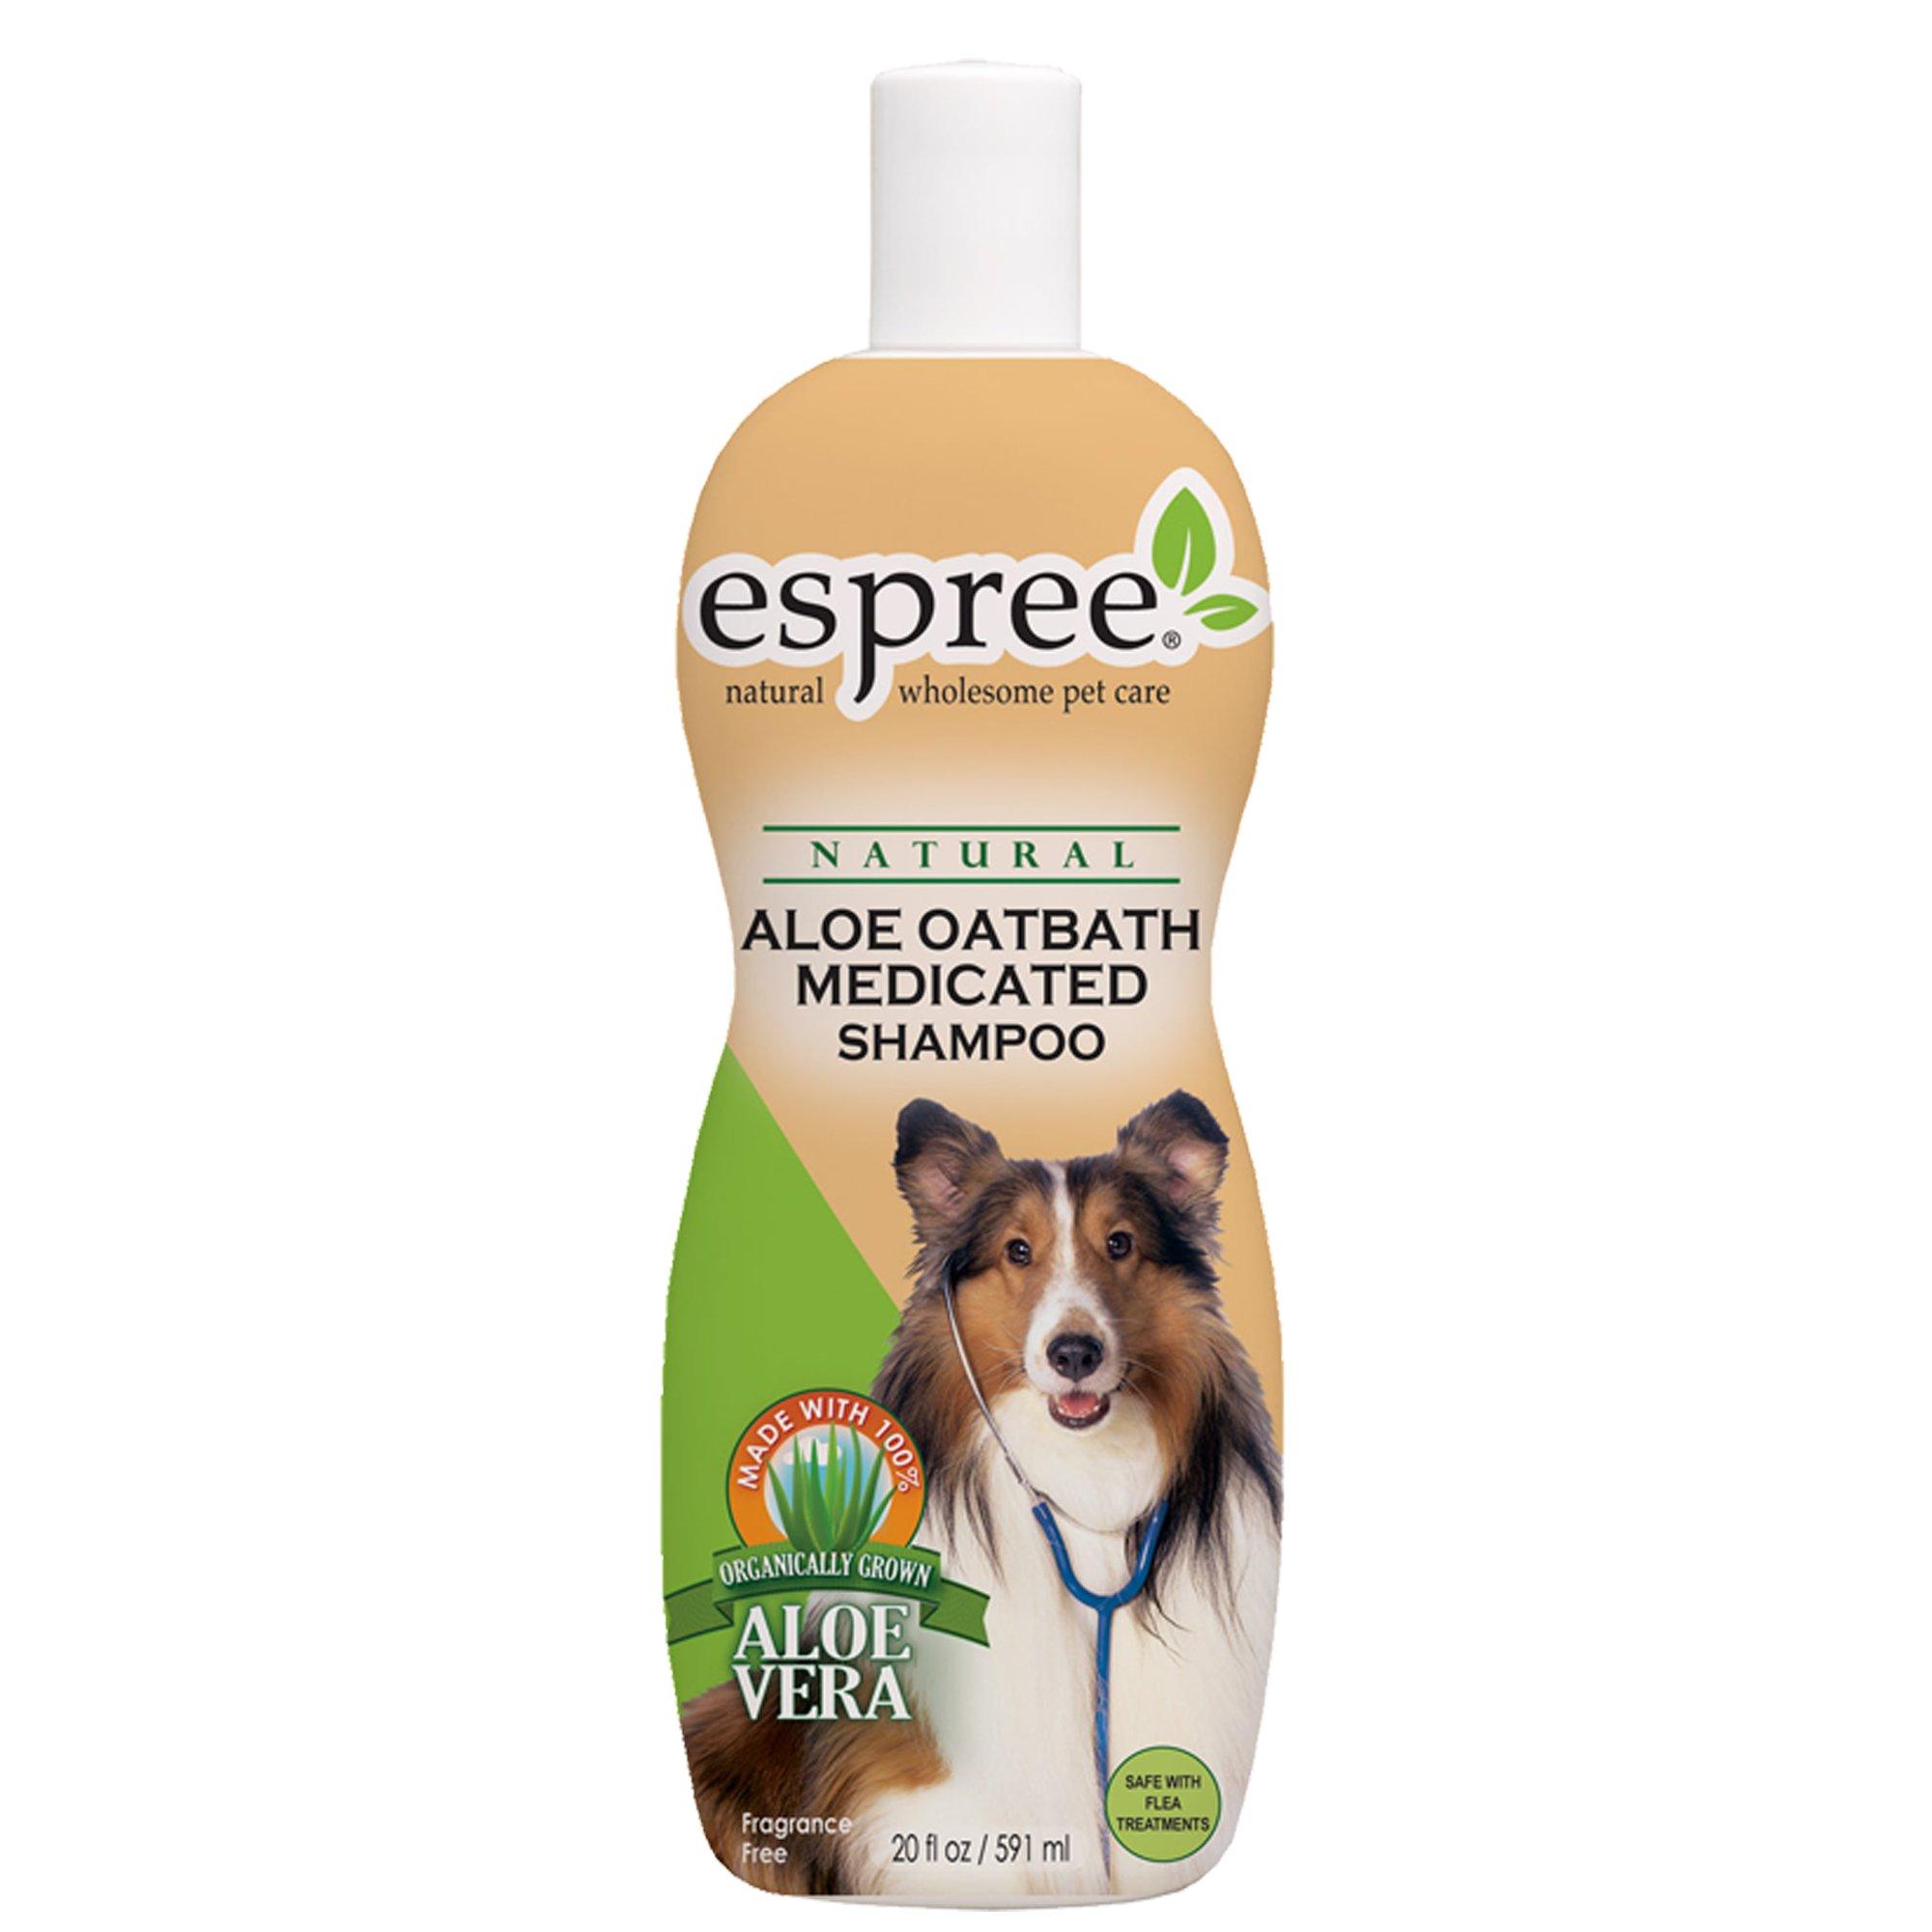 Espree Natural Aloe Oatbath Dog & Cat Shampoo